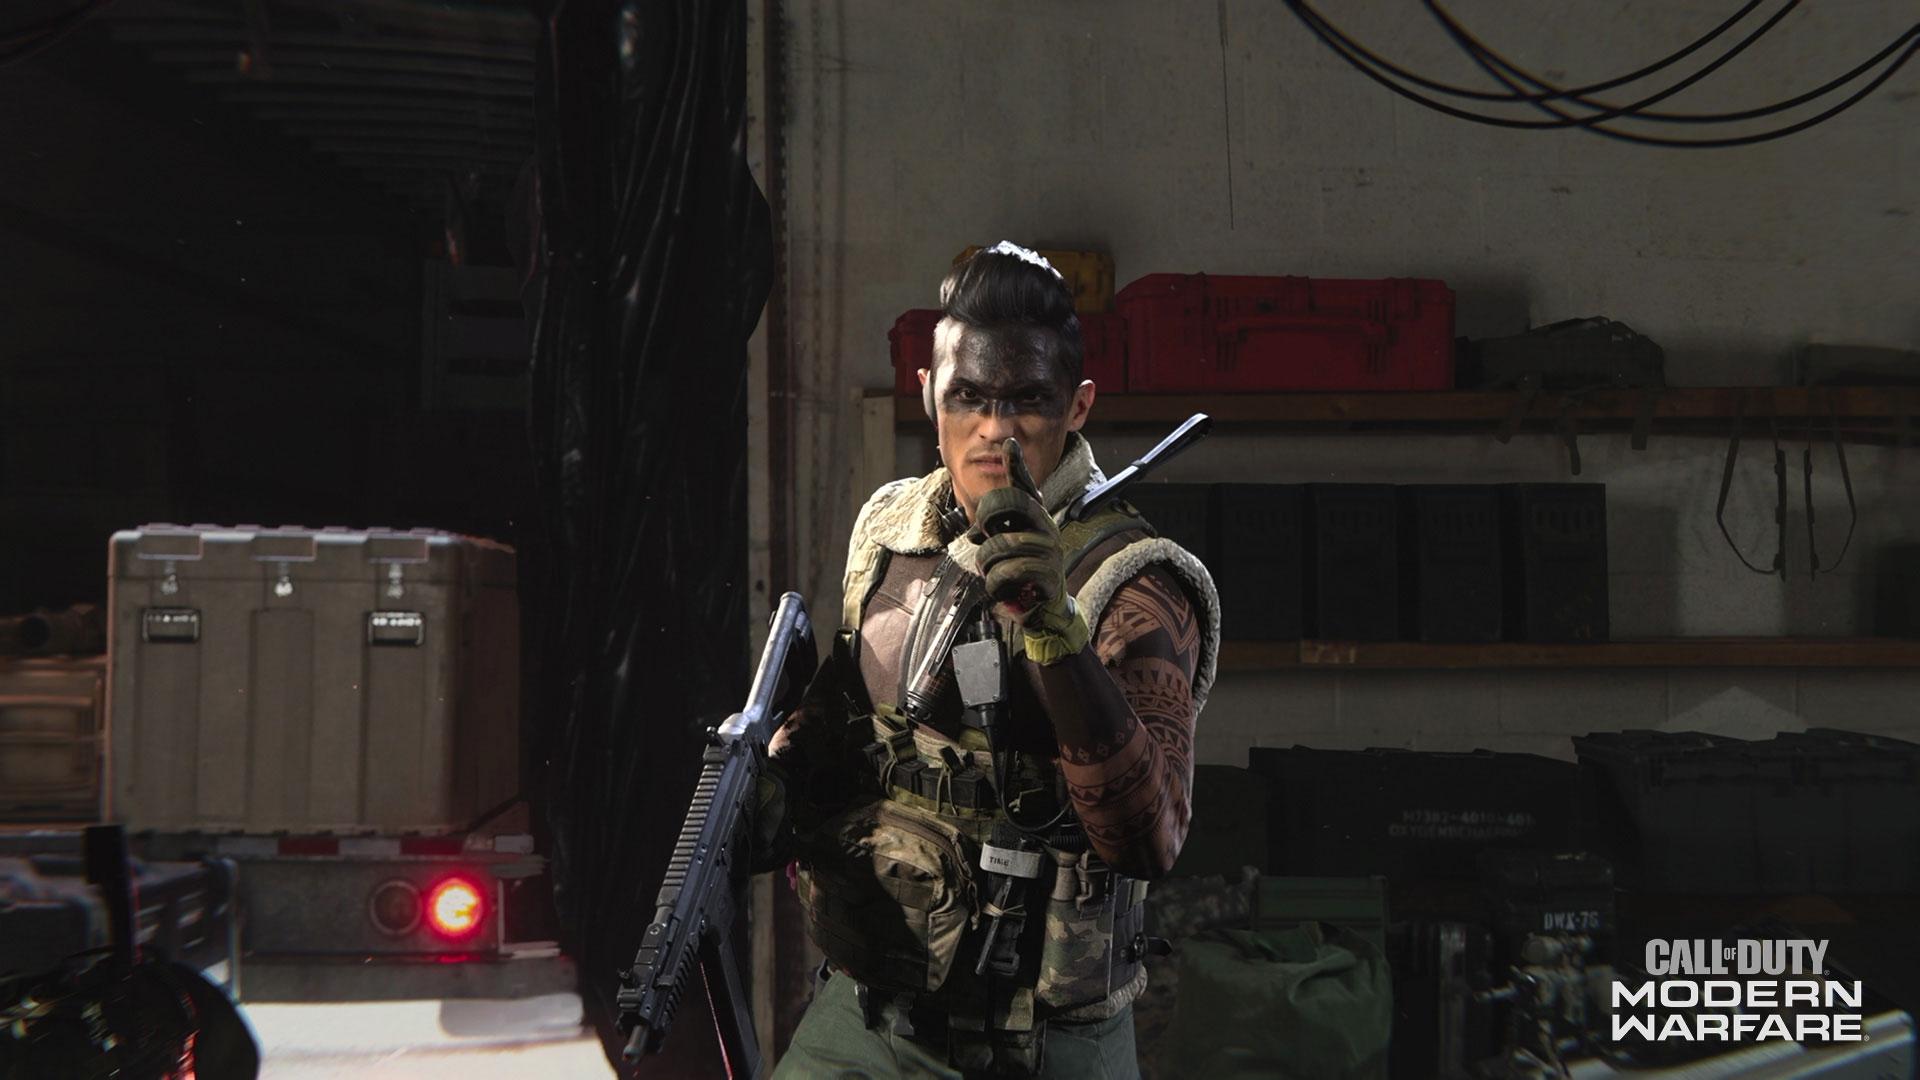 Call Of Duty Modern Warfare Update 1 18 Adds Talon Warzone Guns Patch Notes